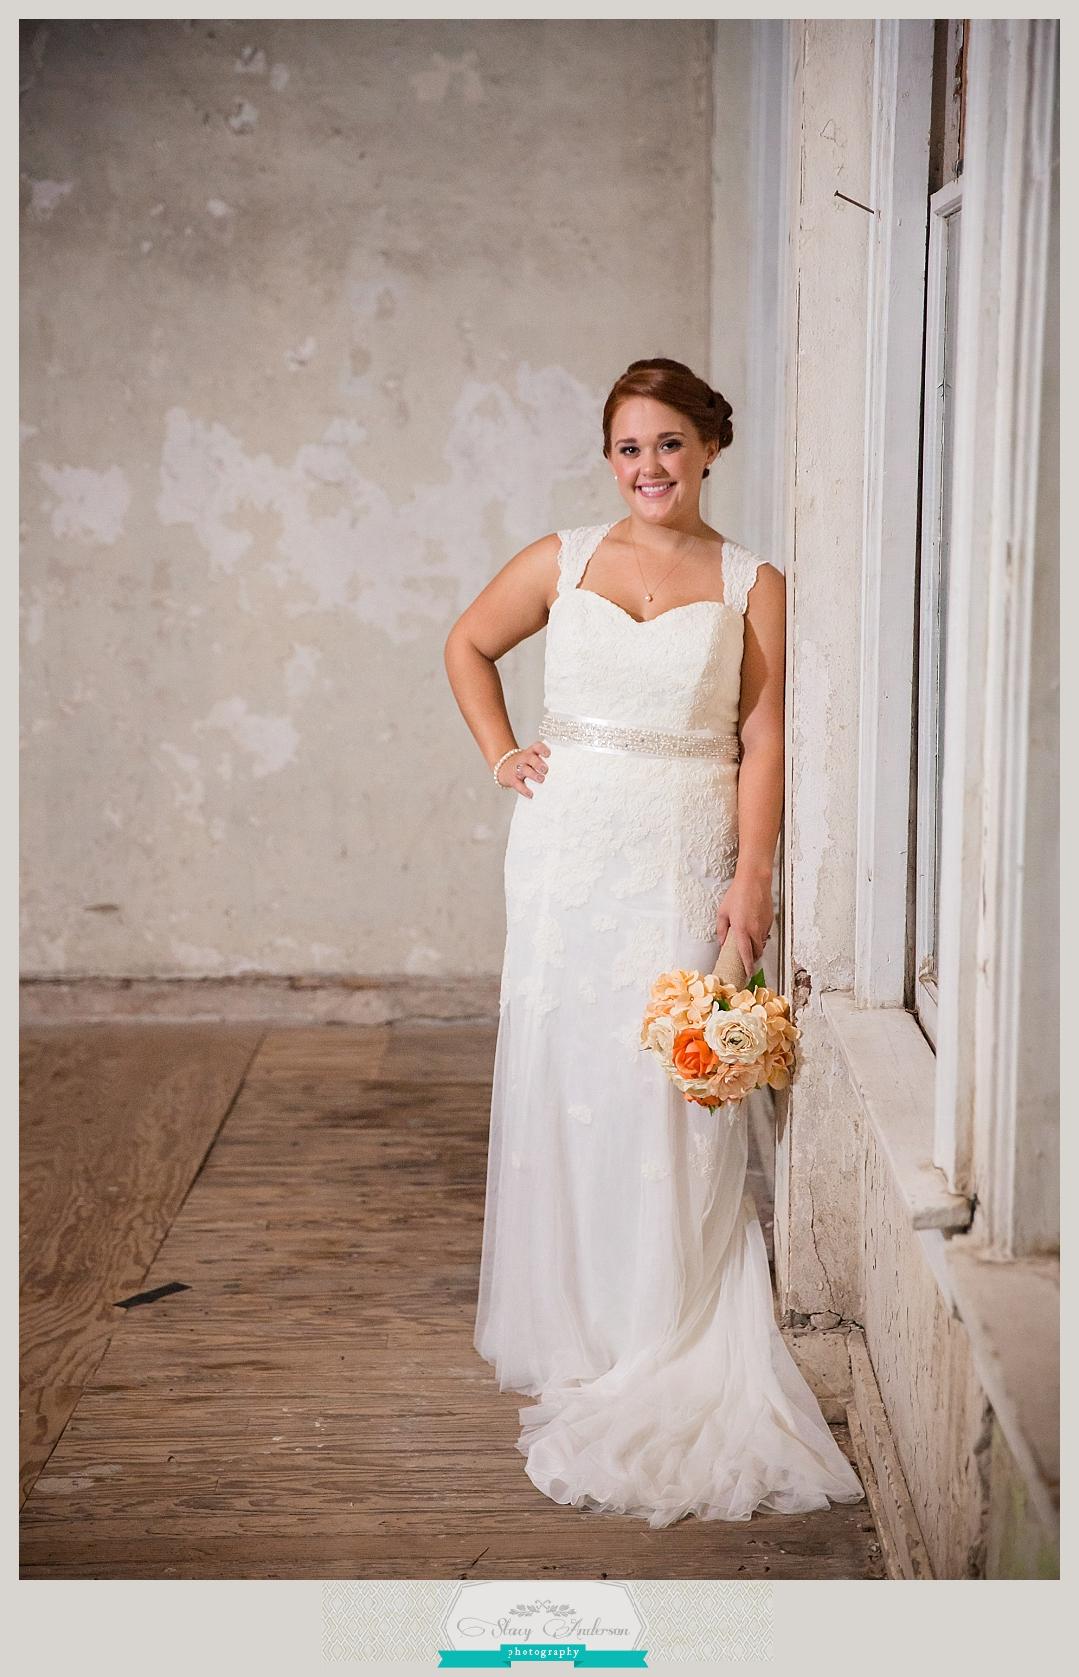 Houston Studio Bridal Wedding Photographer (24)